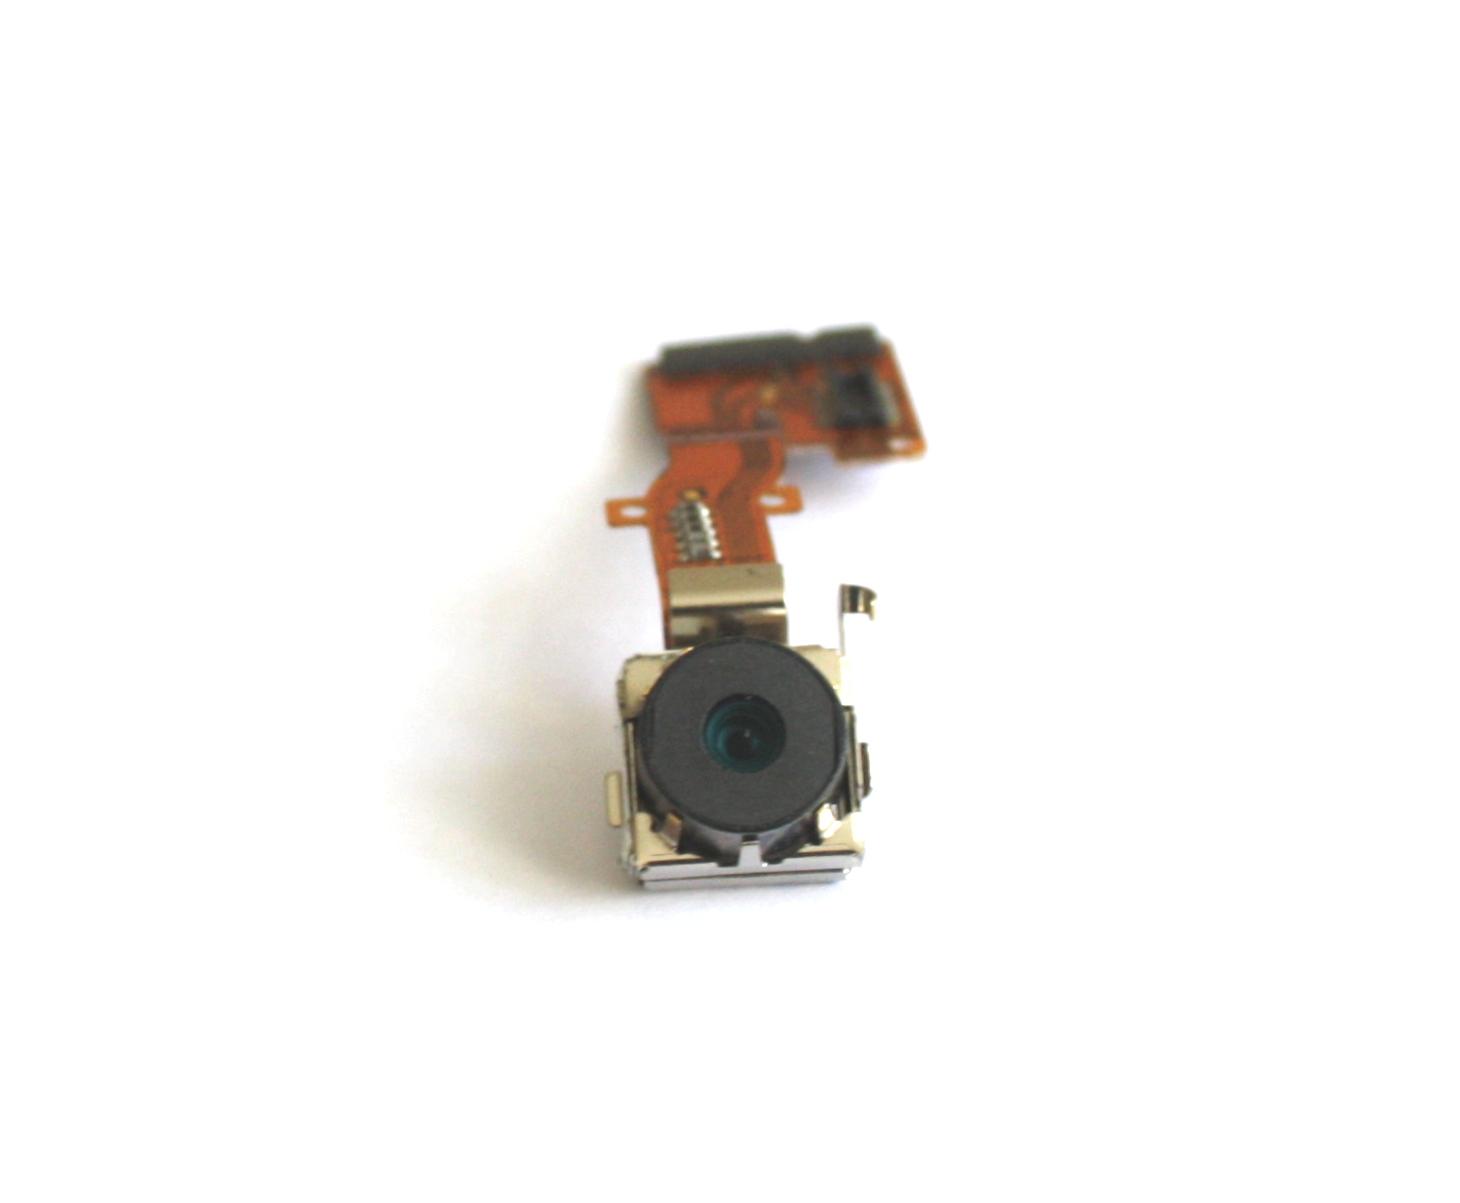 Camera Nokia 6131 with flat